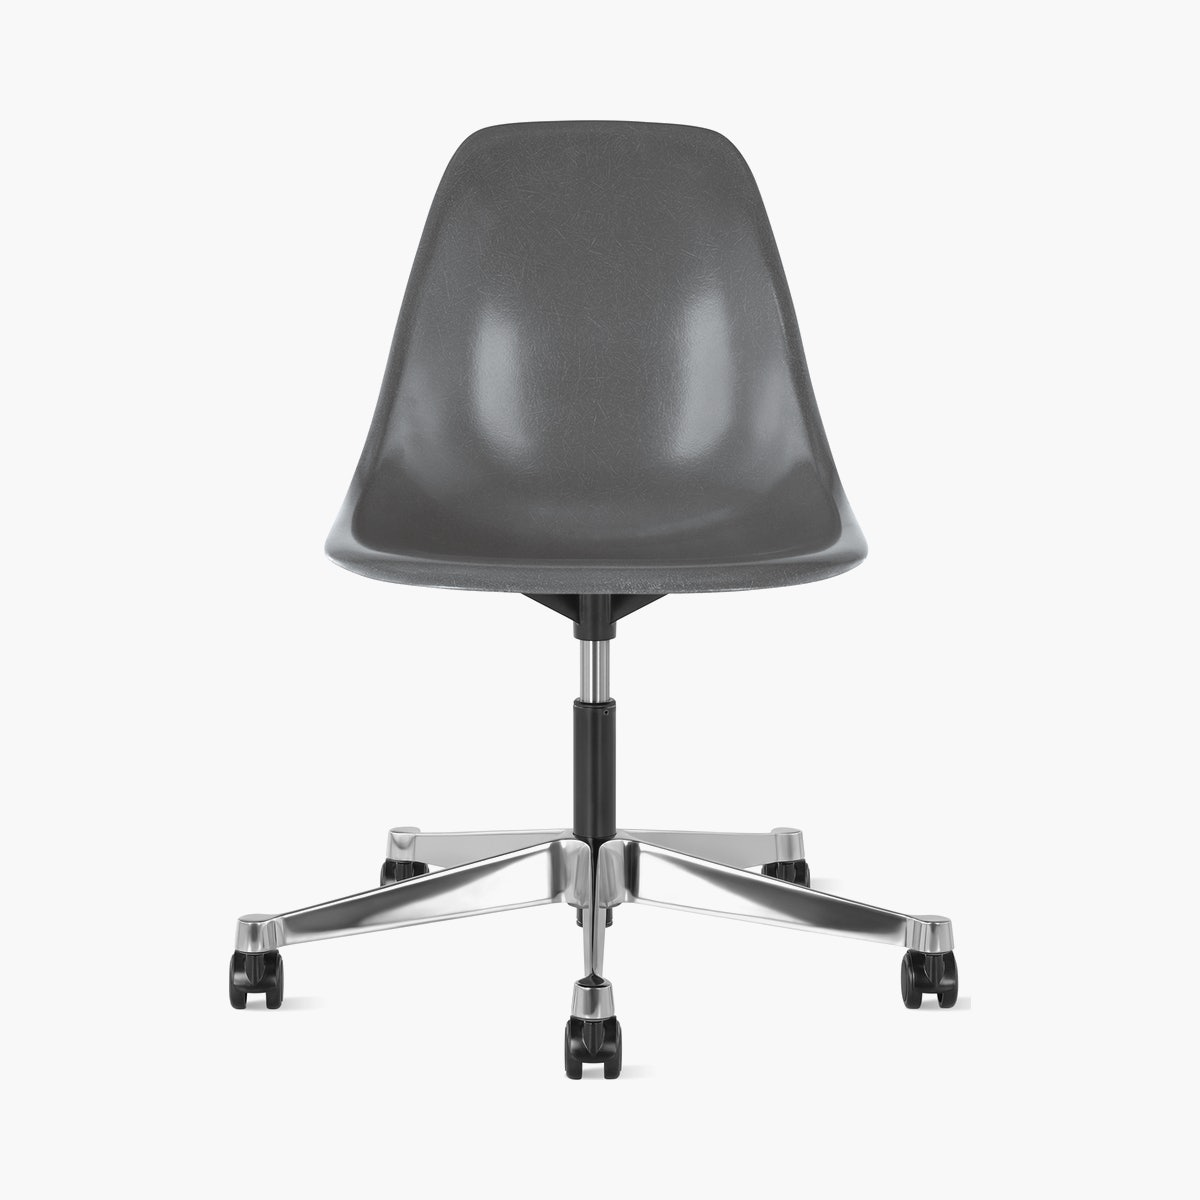 Eames Task Chair, Molded Fiberglass Side Chair